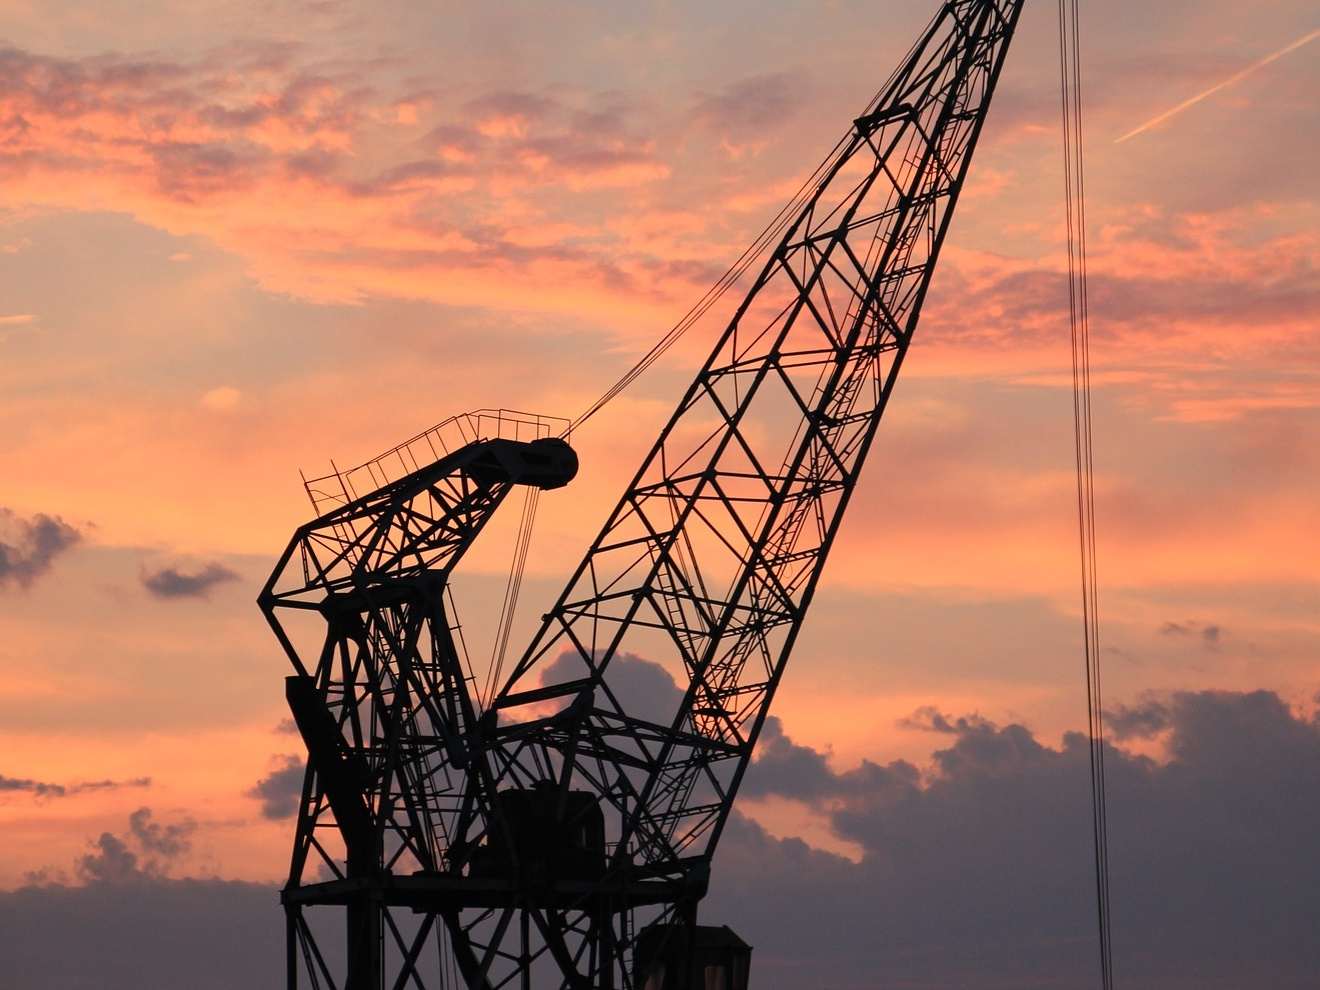 A harbour crane. Image Credit:   S. Hermann & F. Richter  / Unsplash